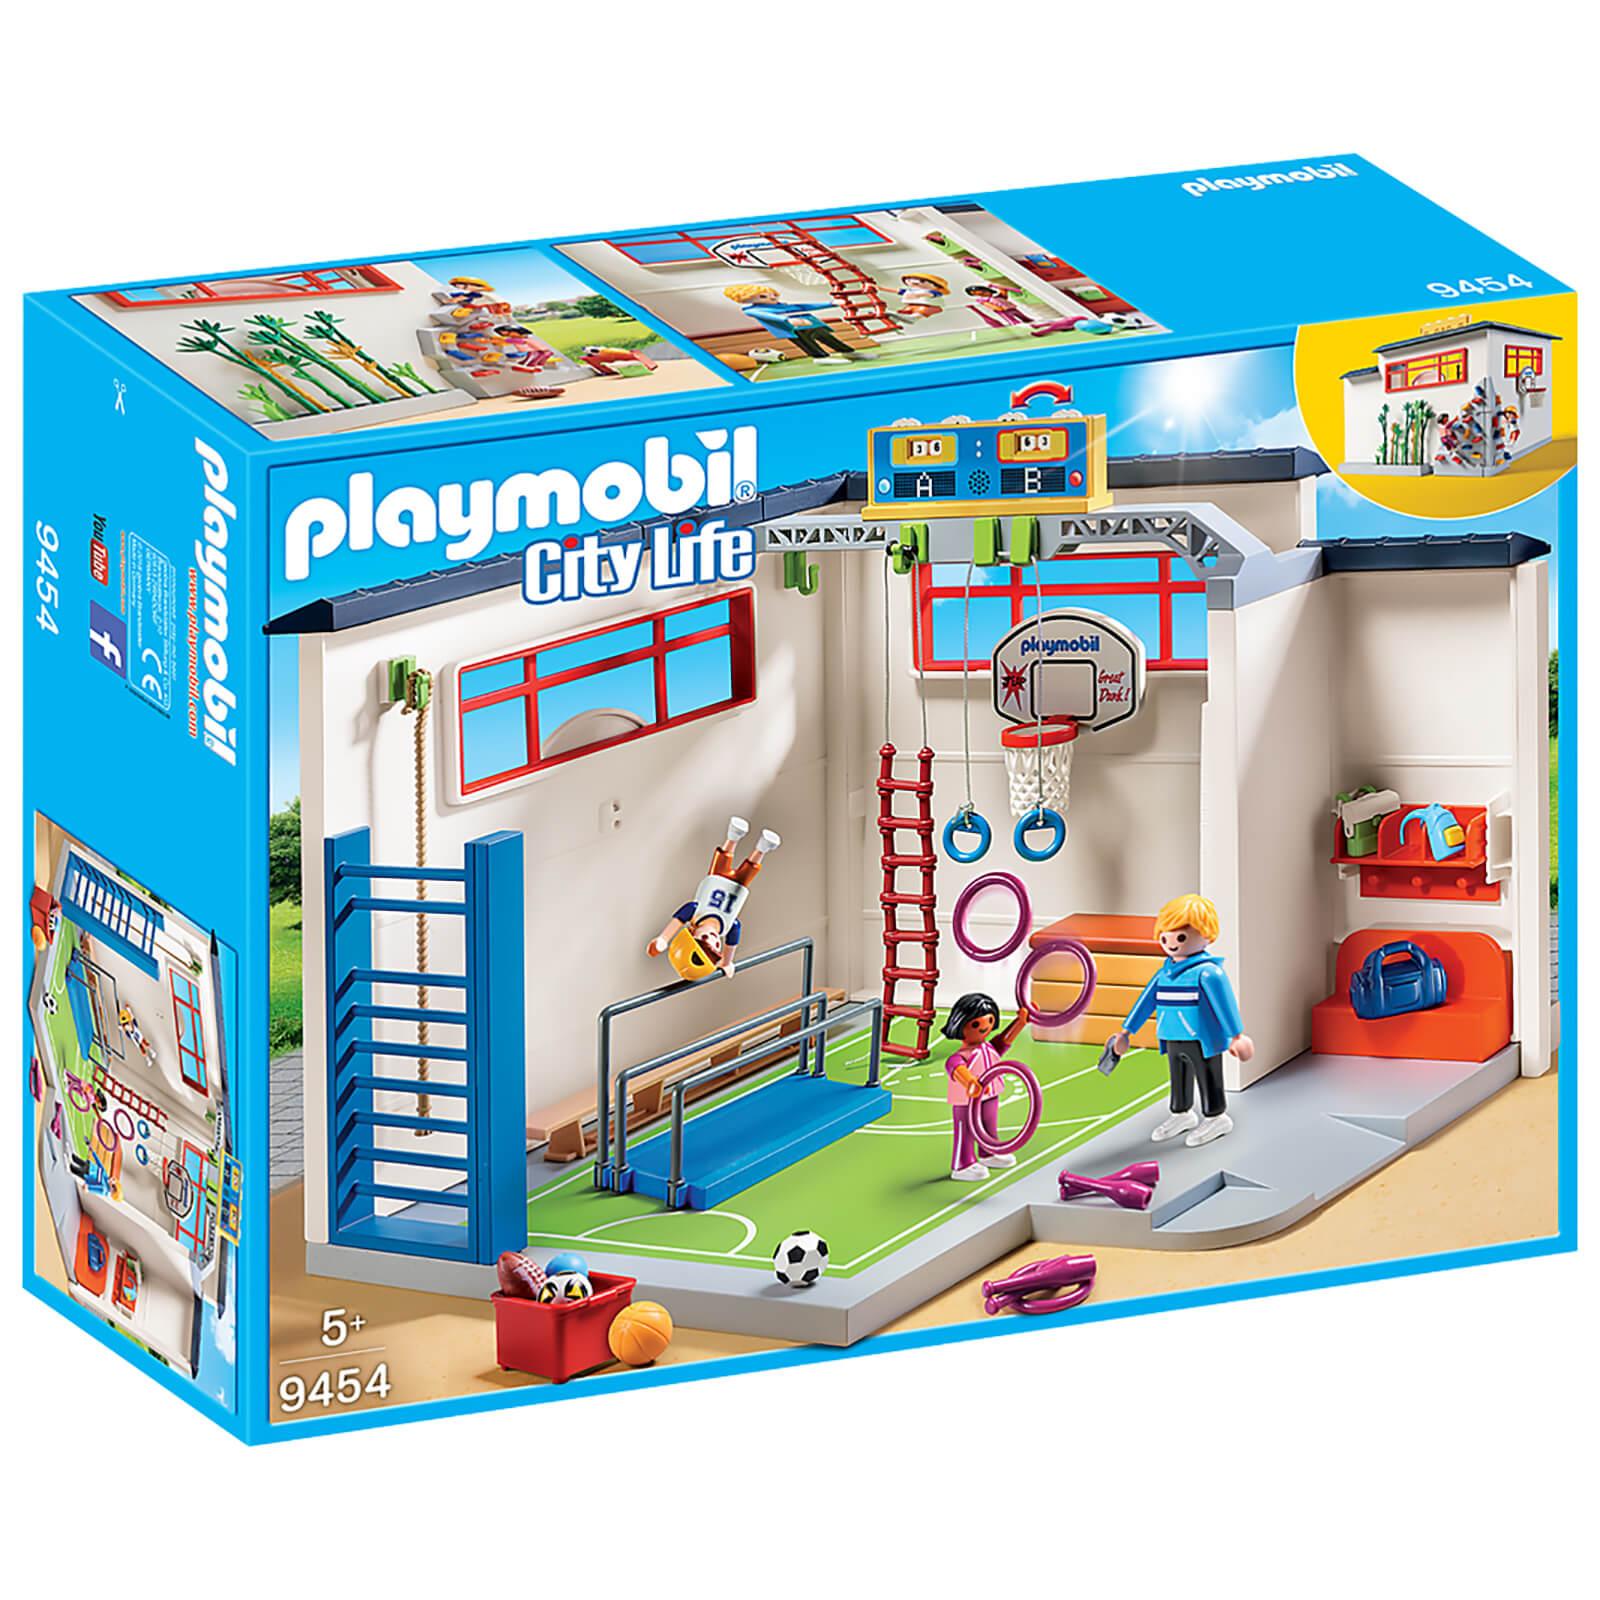 Playmobil City Life Gym with Score Display (9454)